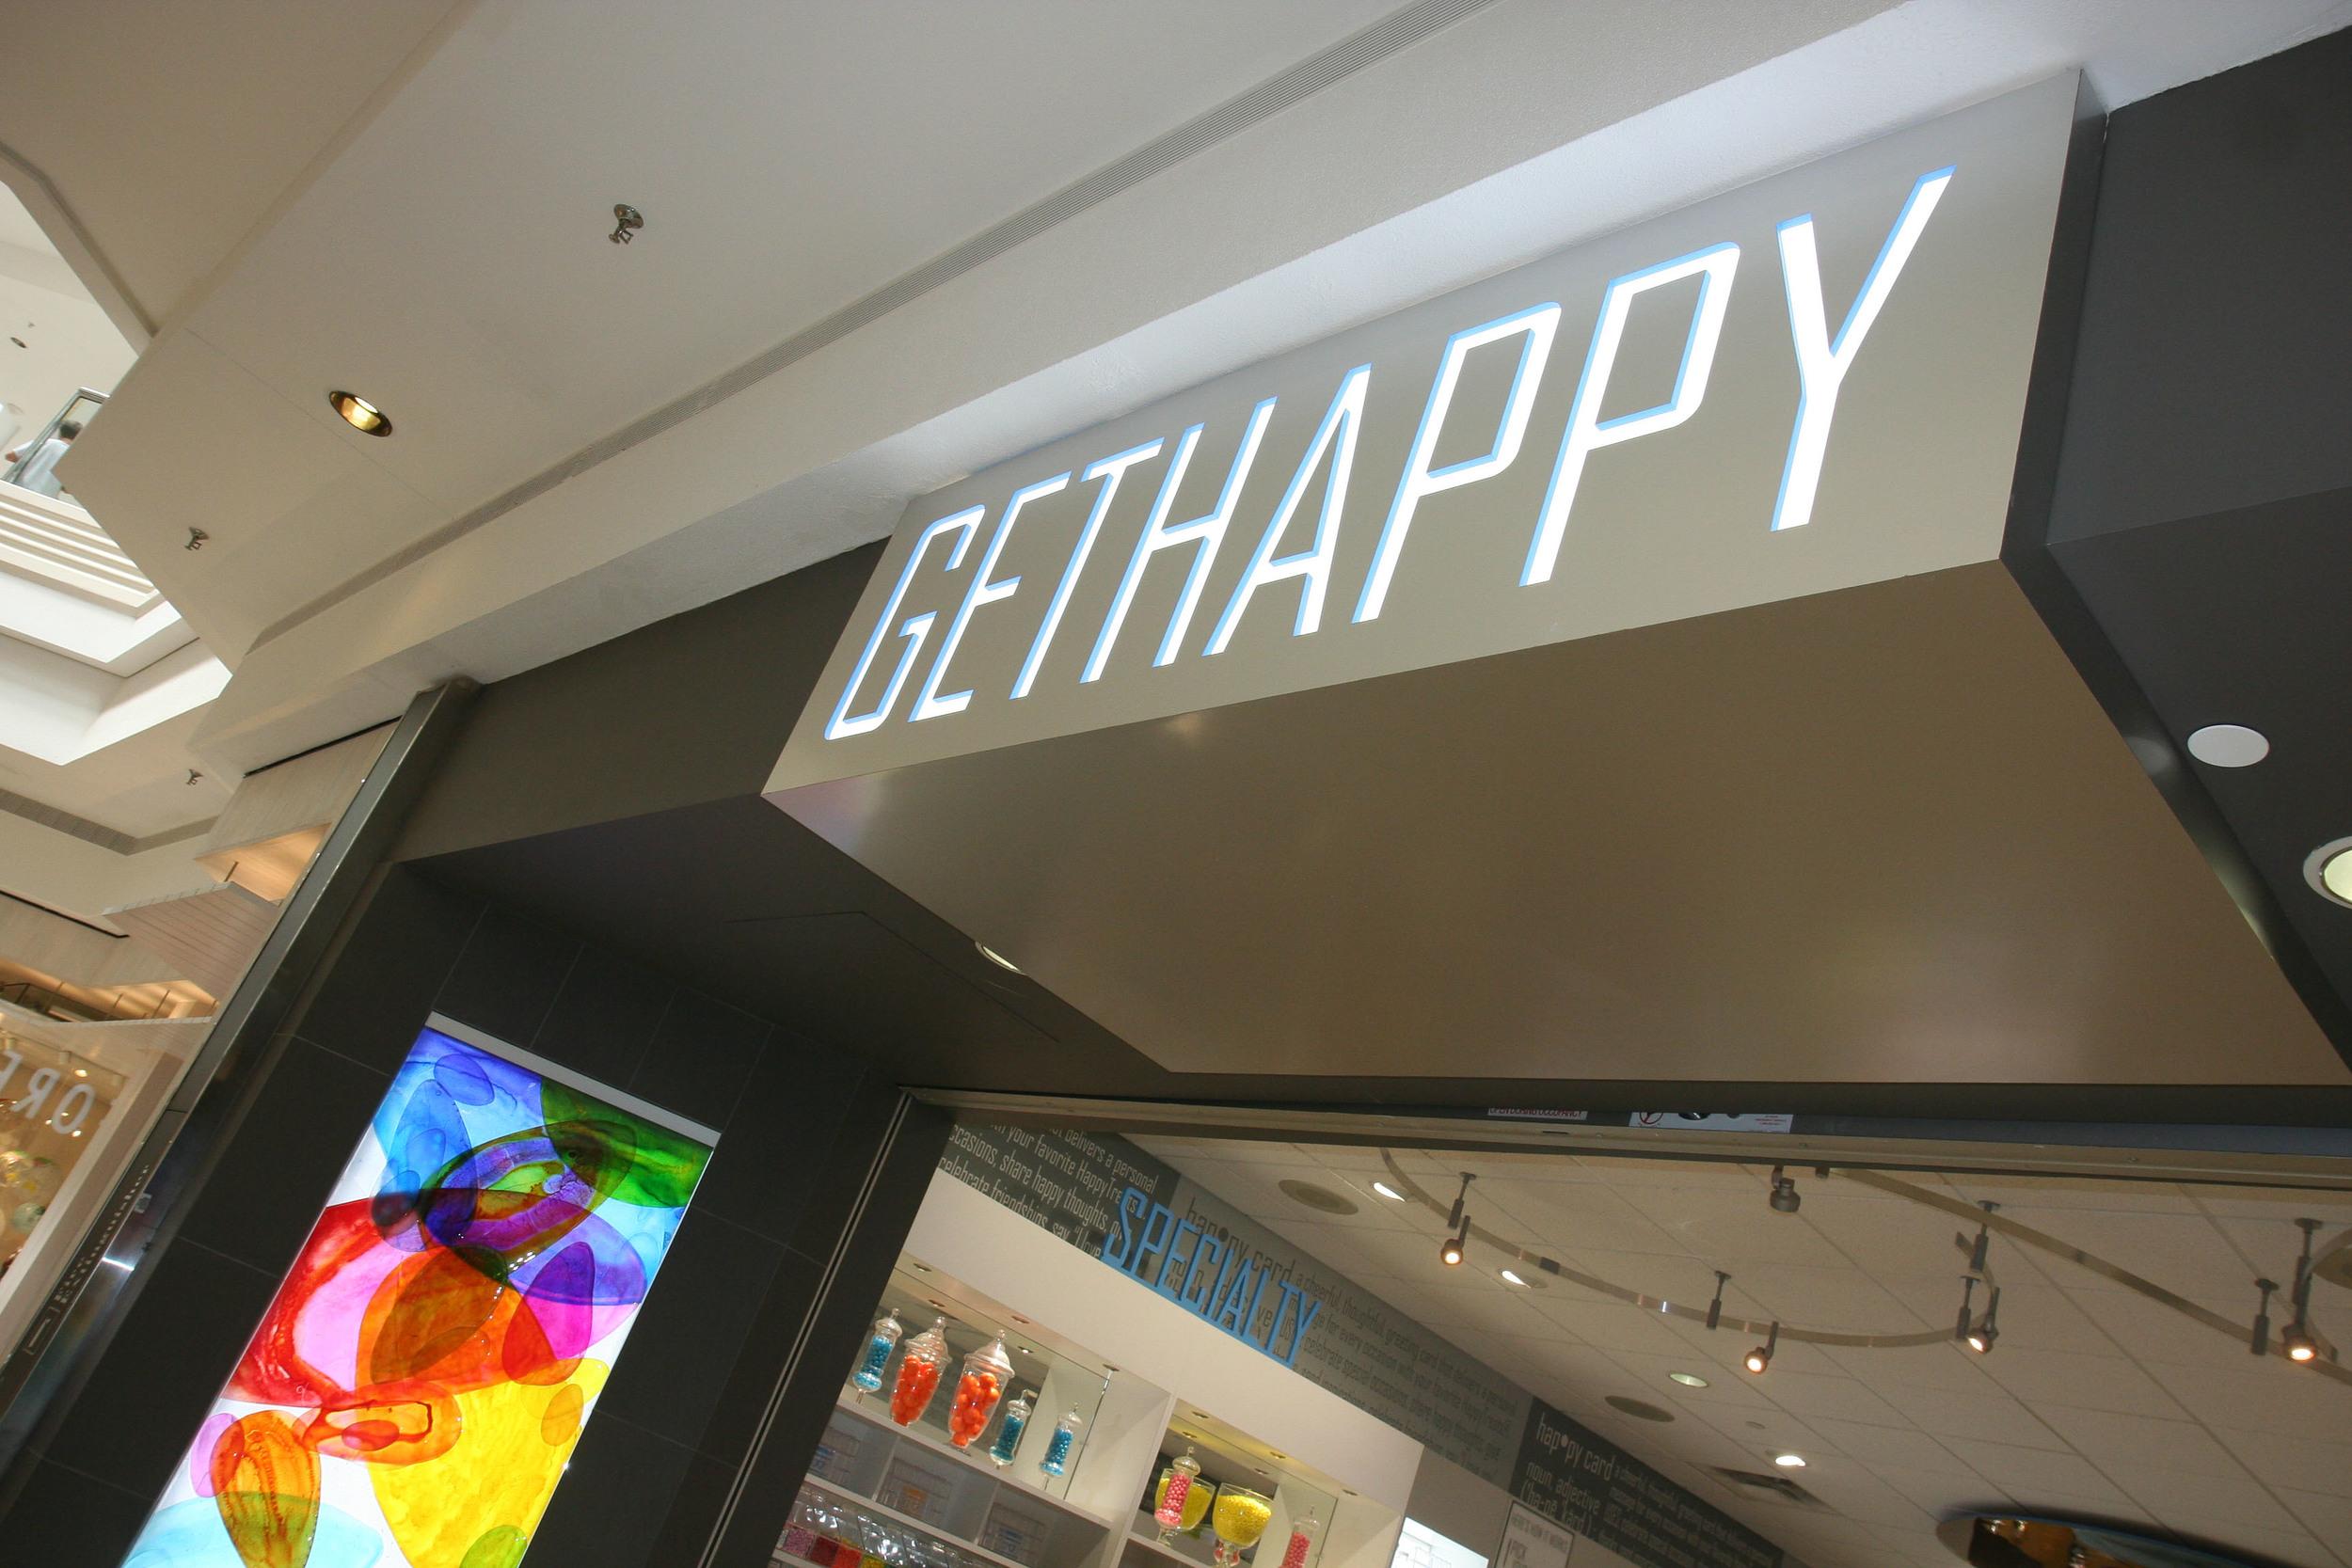 gethappy_retail-14.jpg